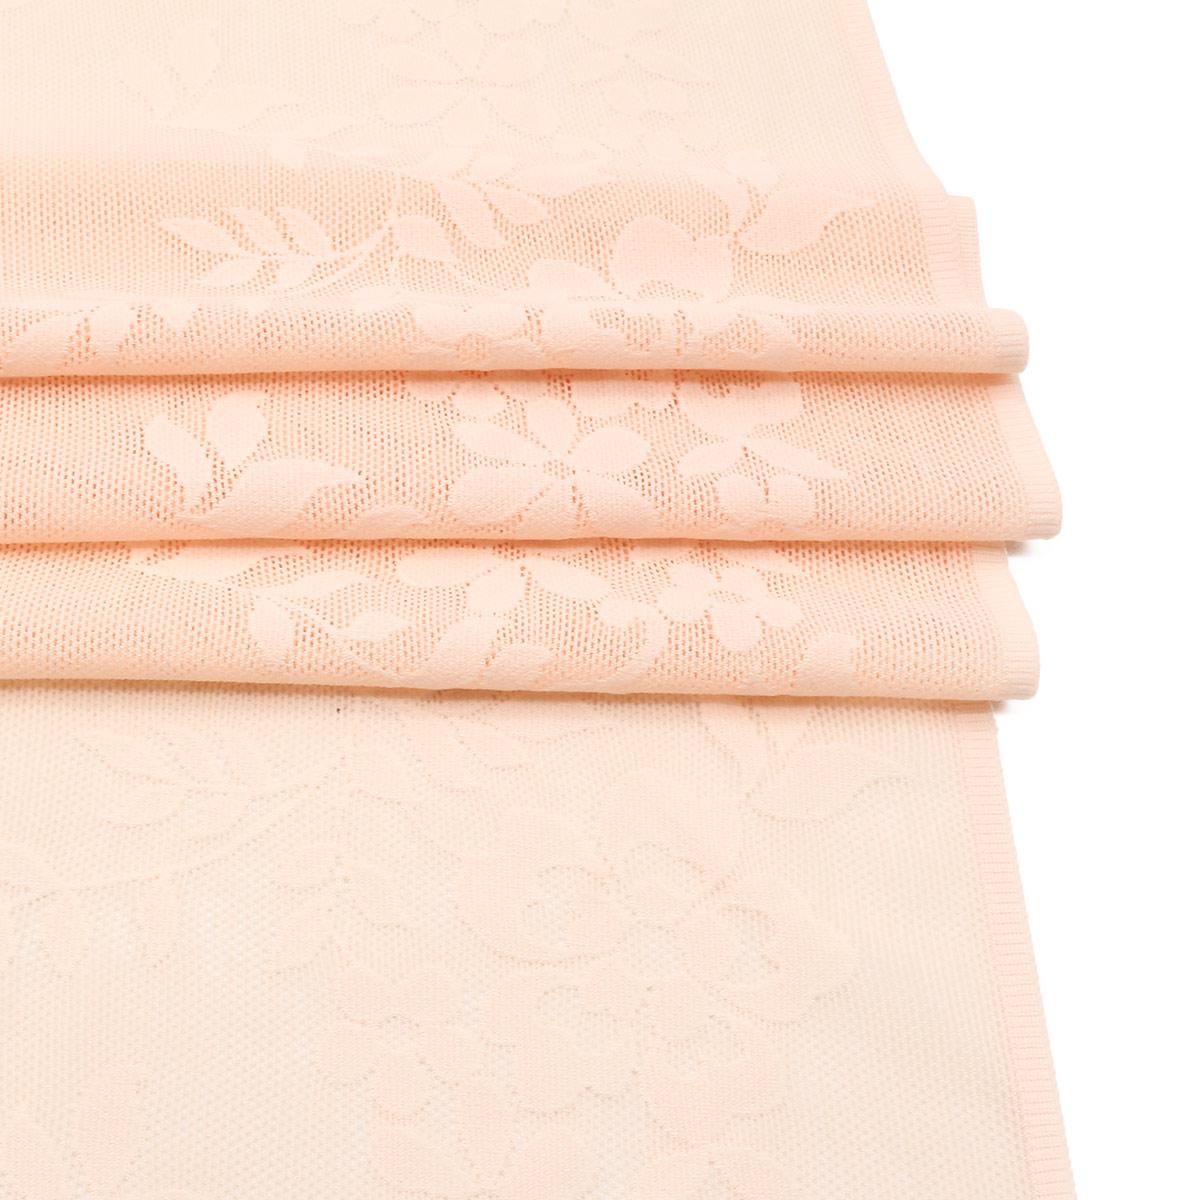 SU 60 Ткань эластичная бельевая 28,5 см*10